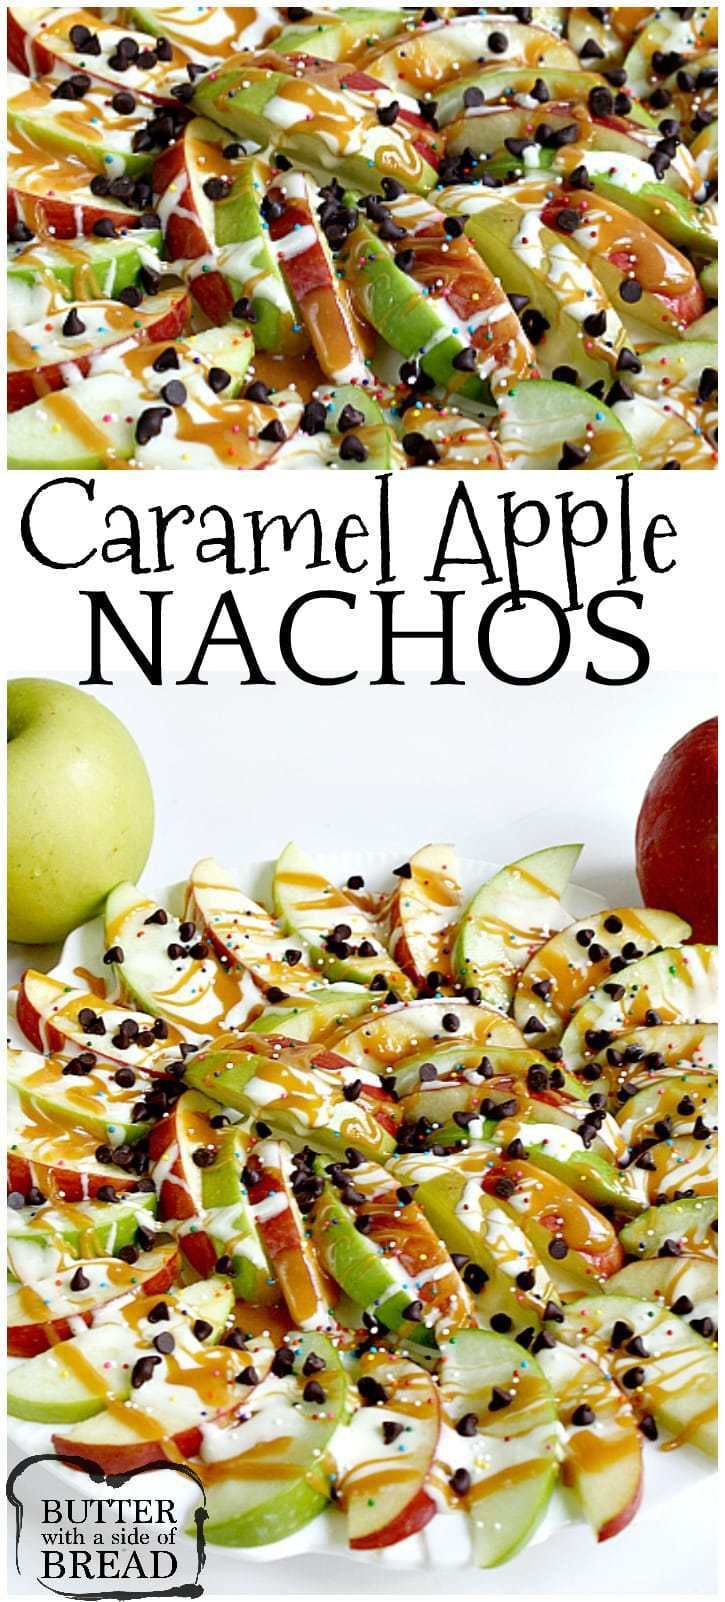 CARAMEL APPLE NACHOS #caramelapples